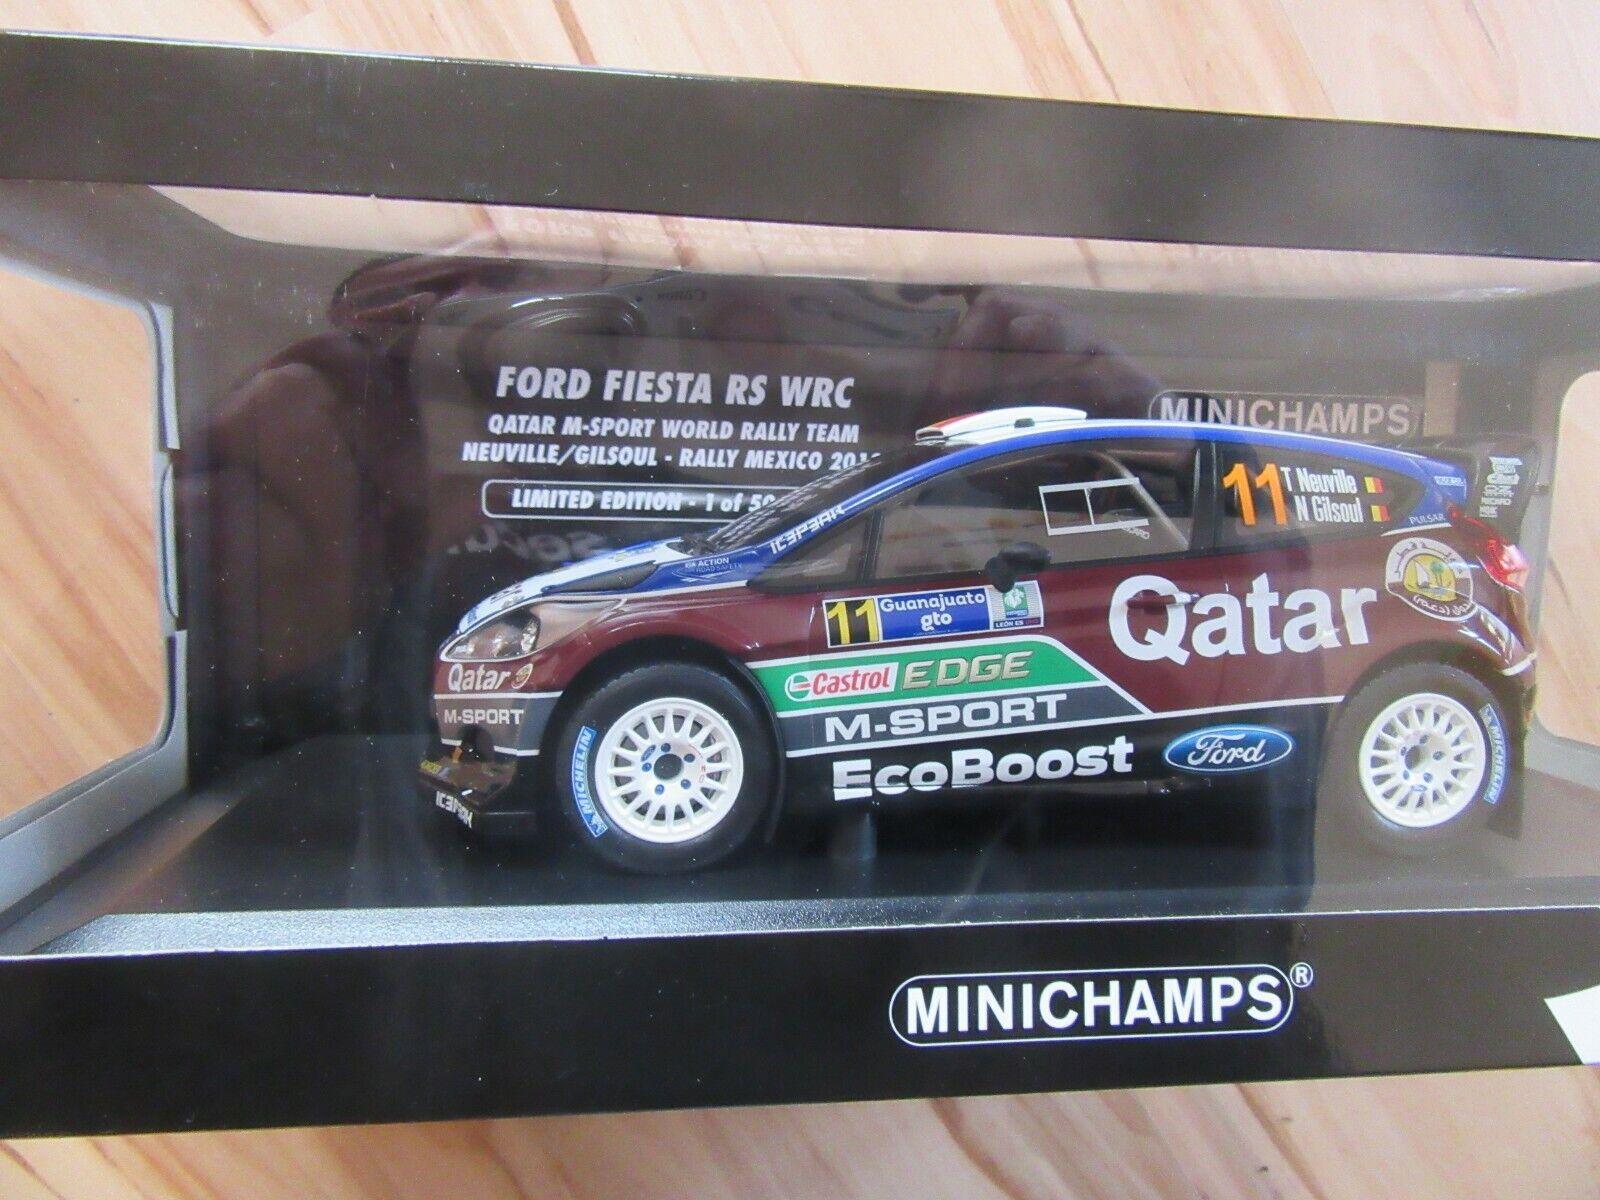 Ford Fiesta WRC Qatar M-Sport Neuville Gilsoul  Mexico 2013 Minichamps  1 18